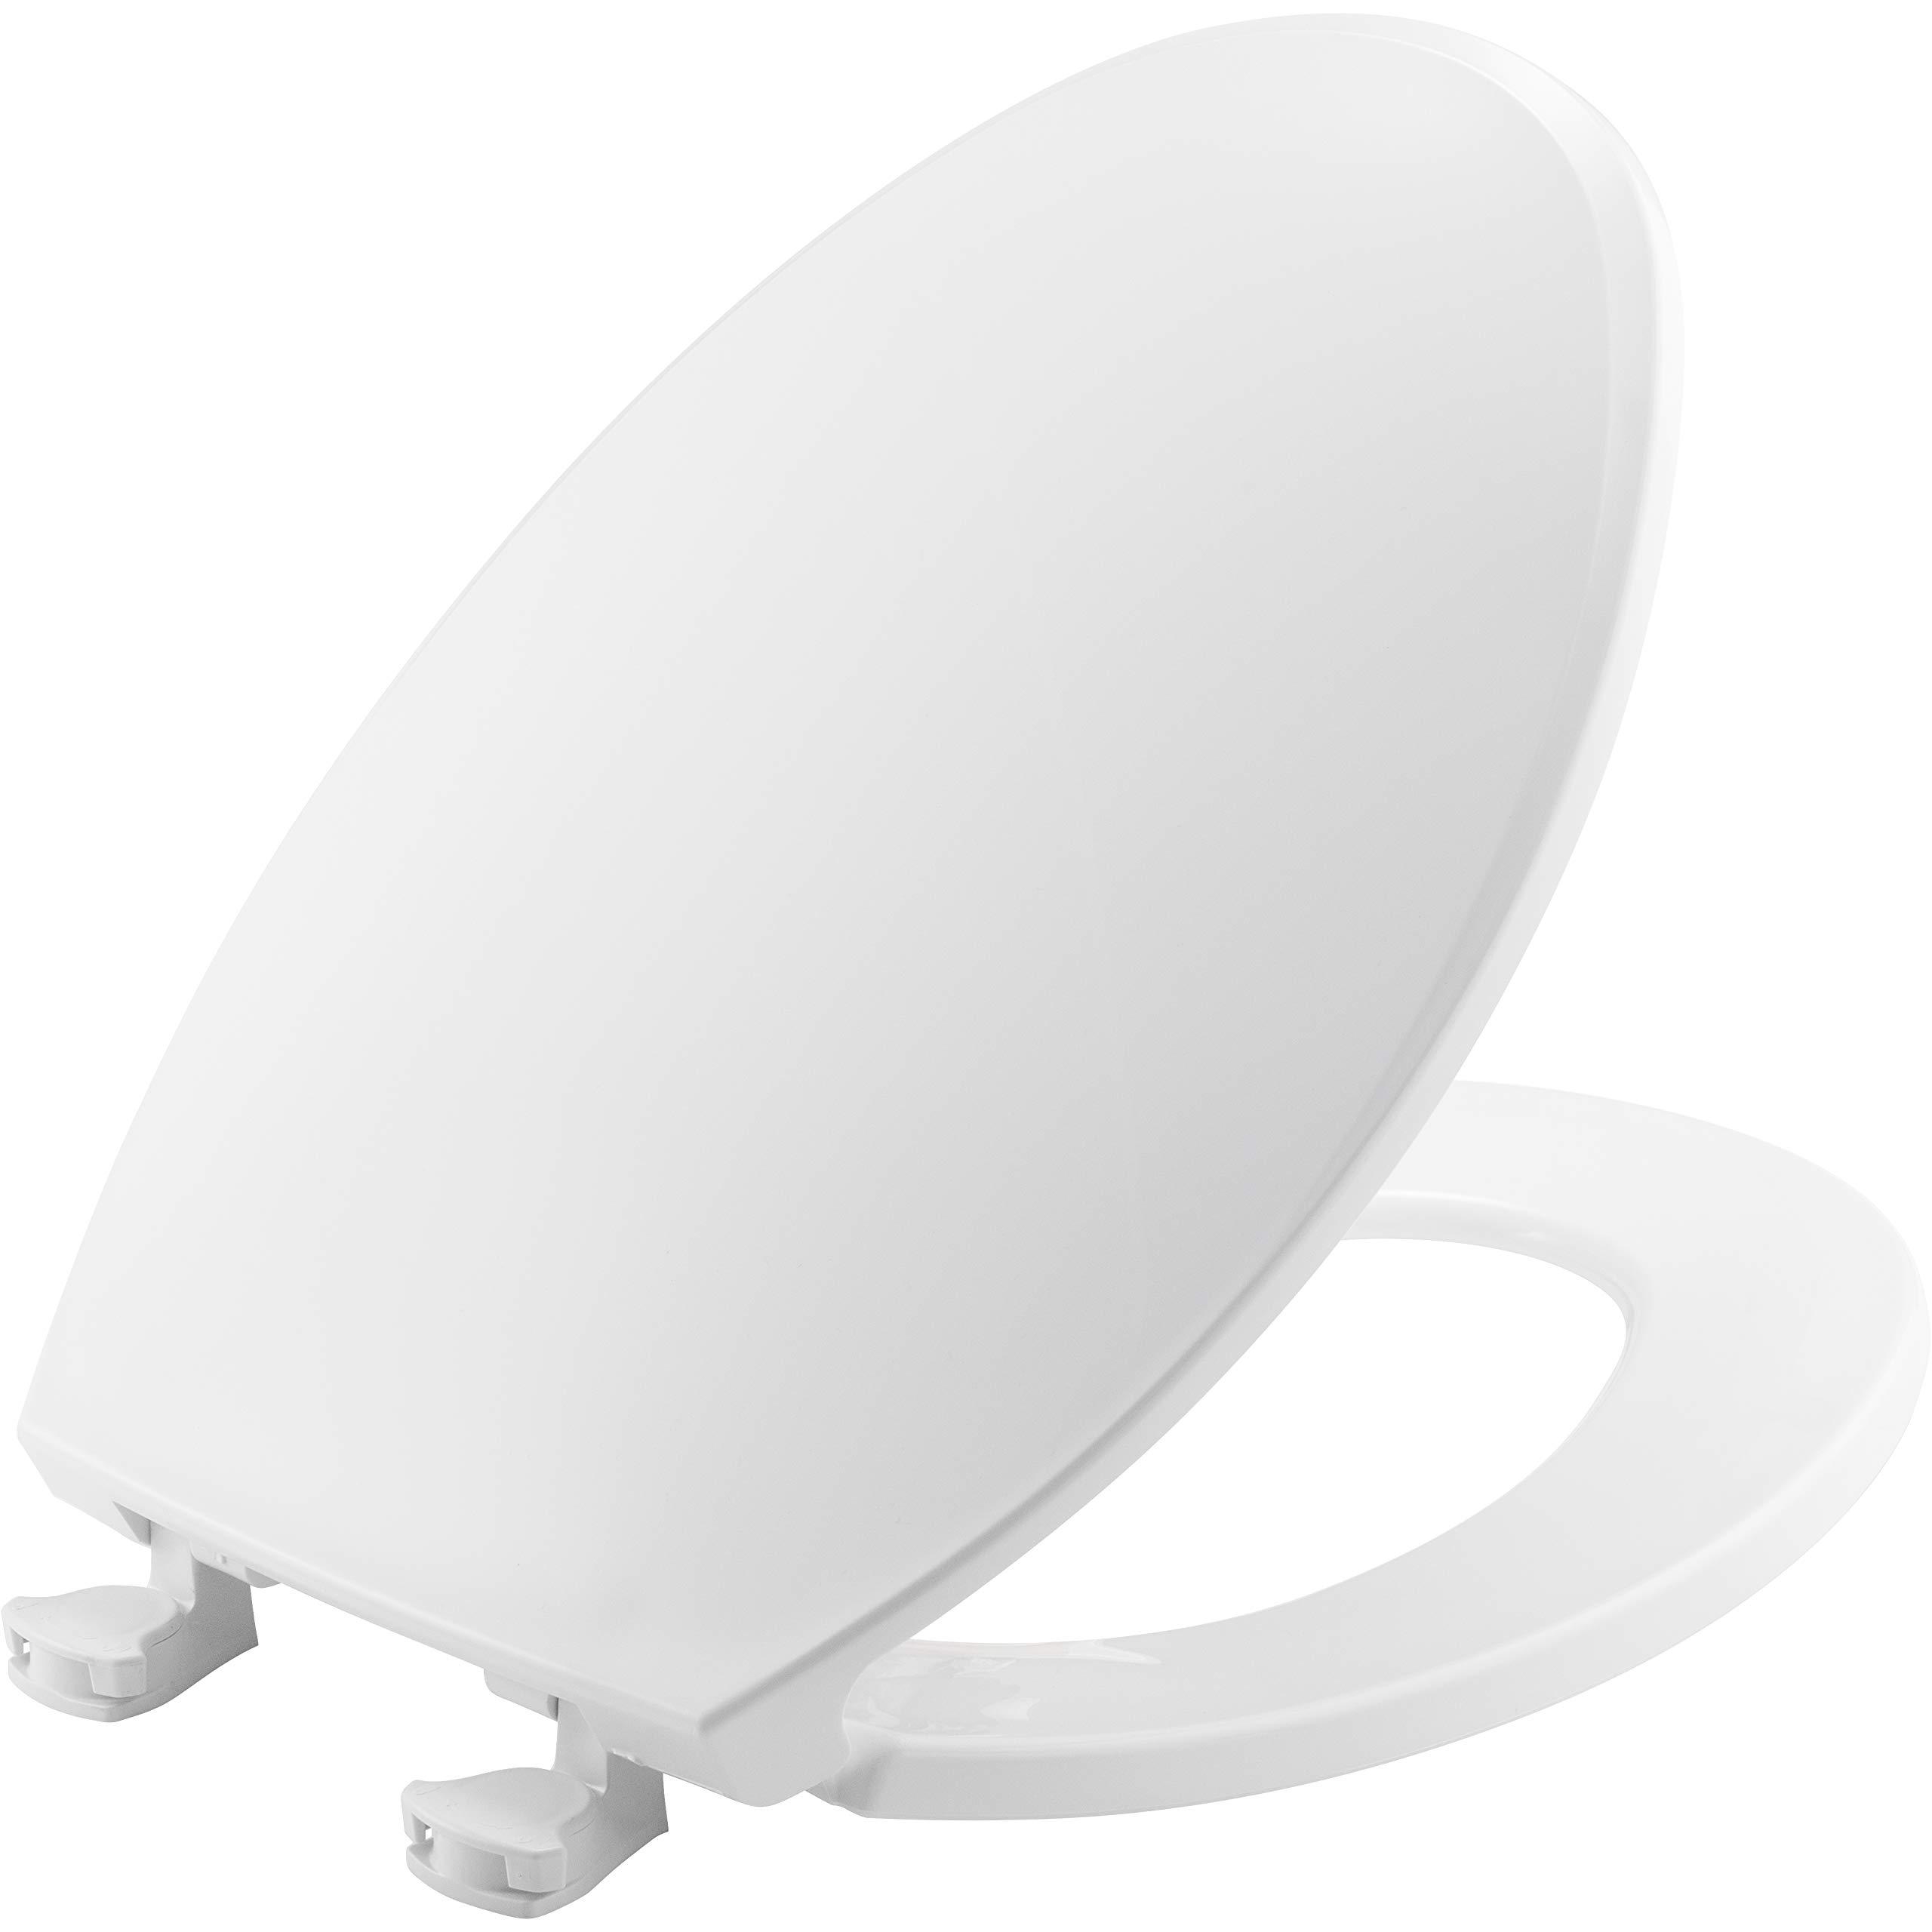 Bemis 1800EC Plastic Elongated Toilet